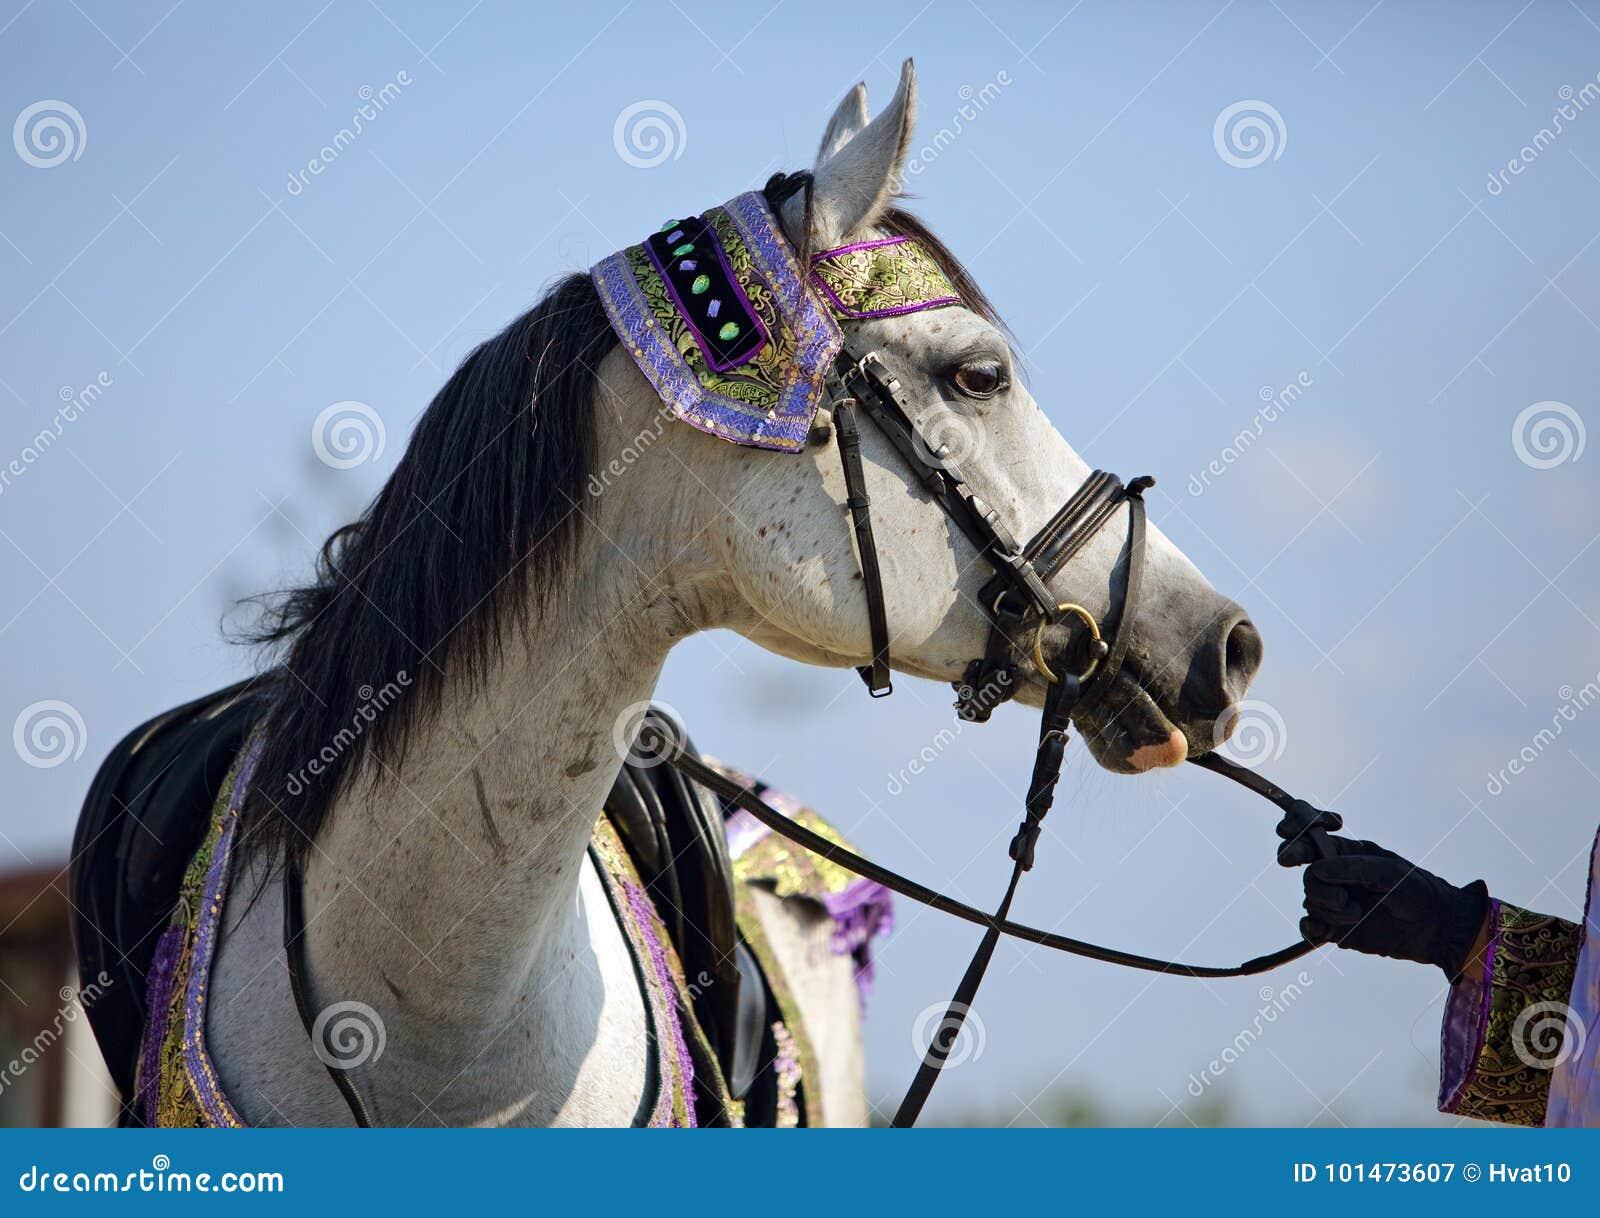 Grey Arabian Horse With Traditional Tack And Saddle Stock Image Image Of Grey Luxury 101473607